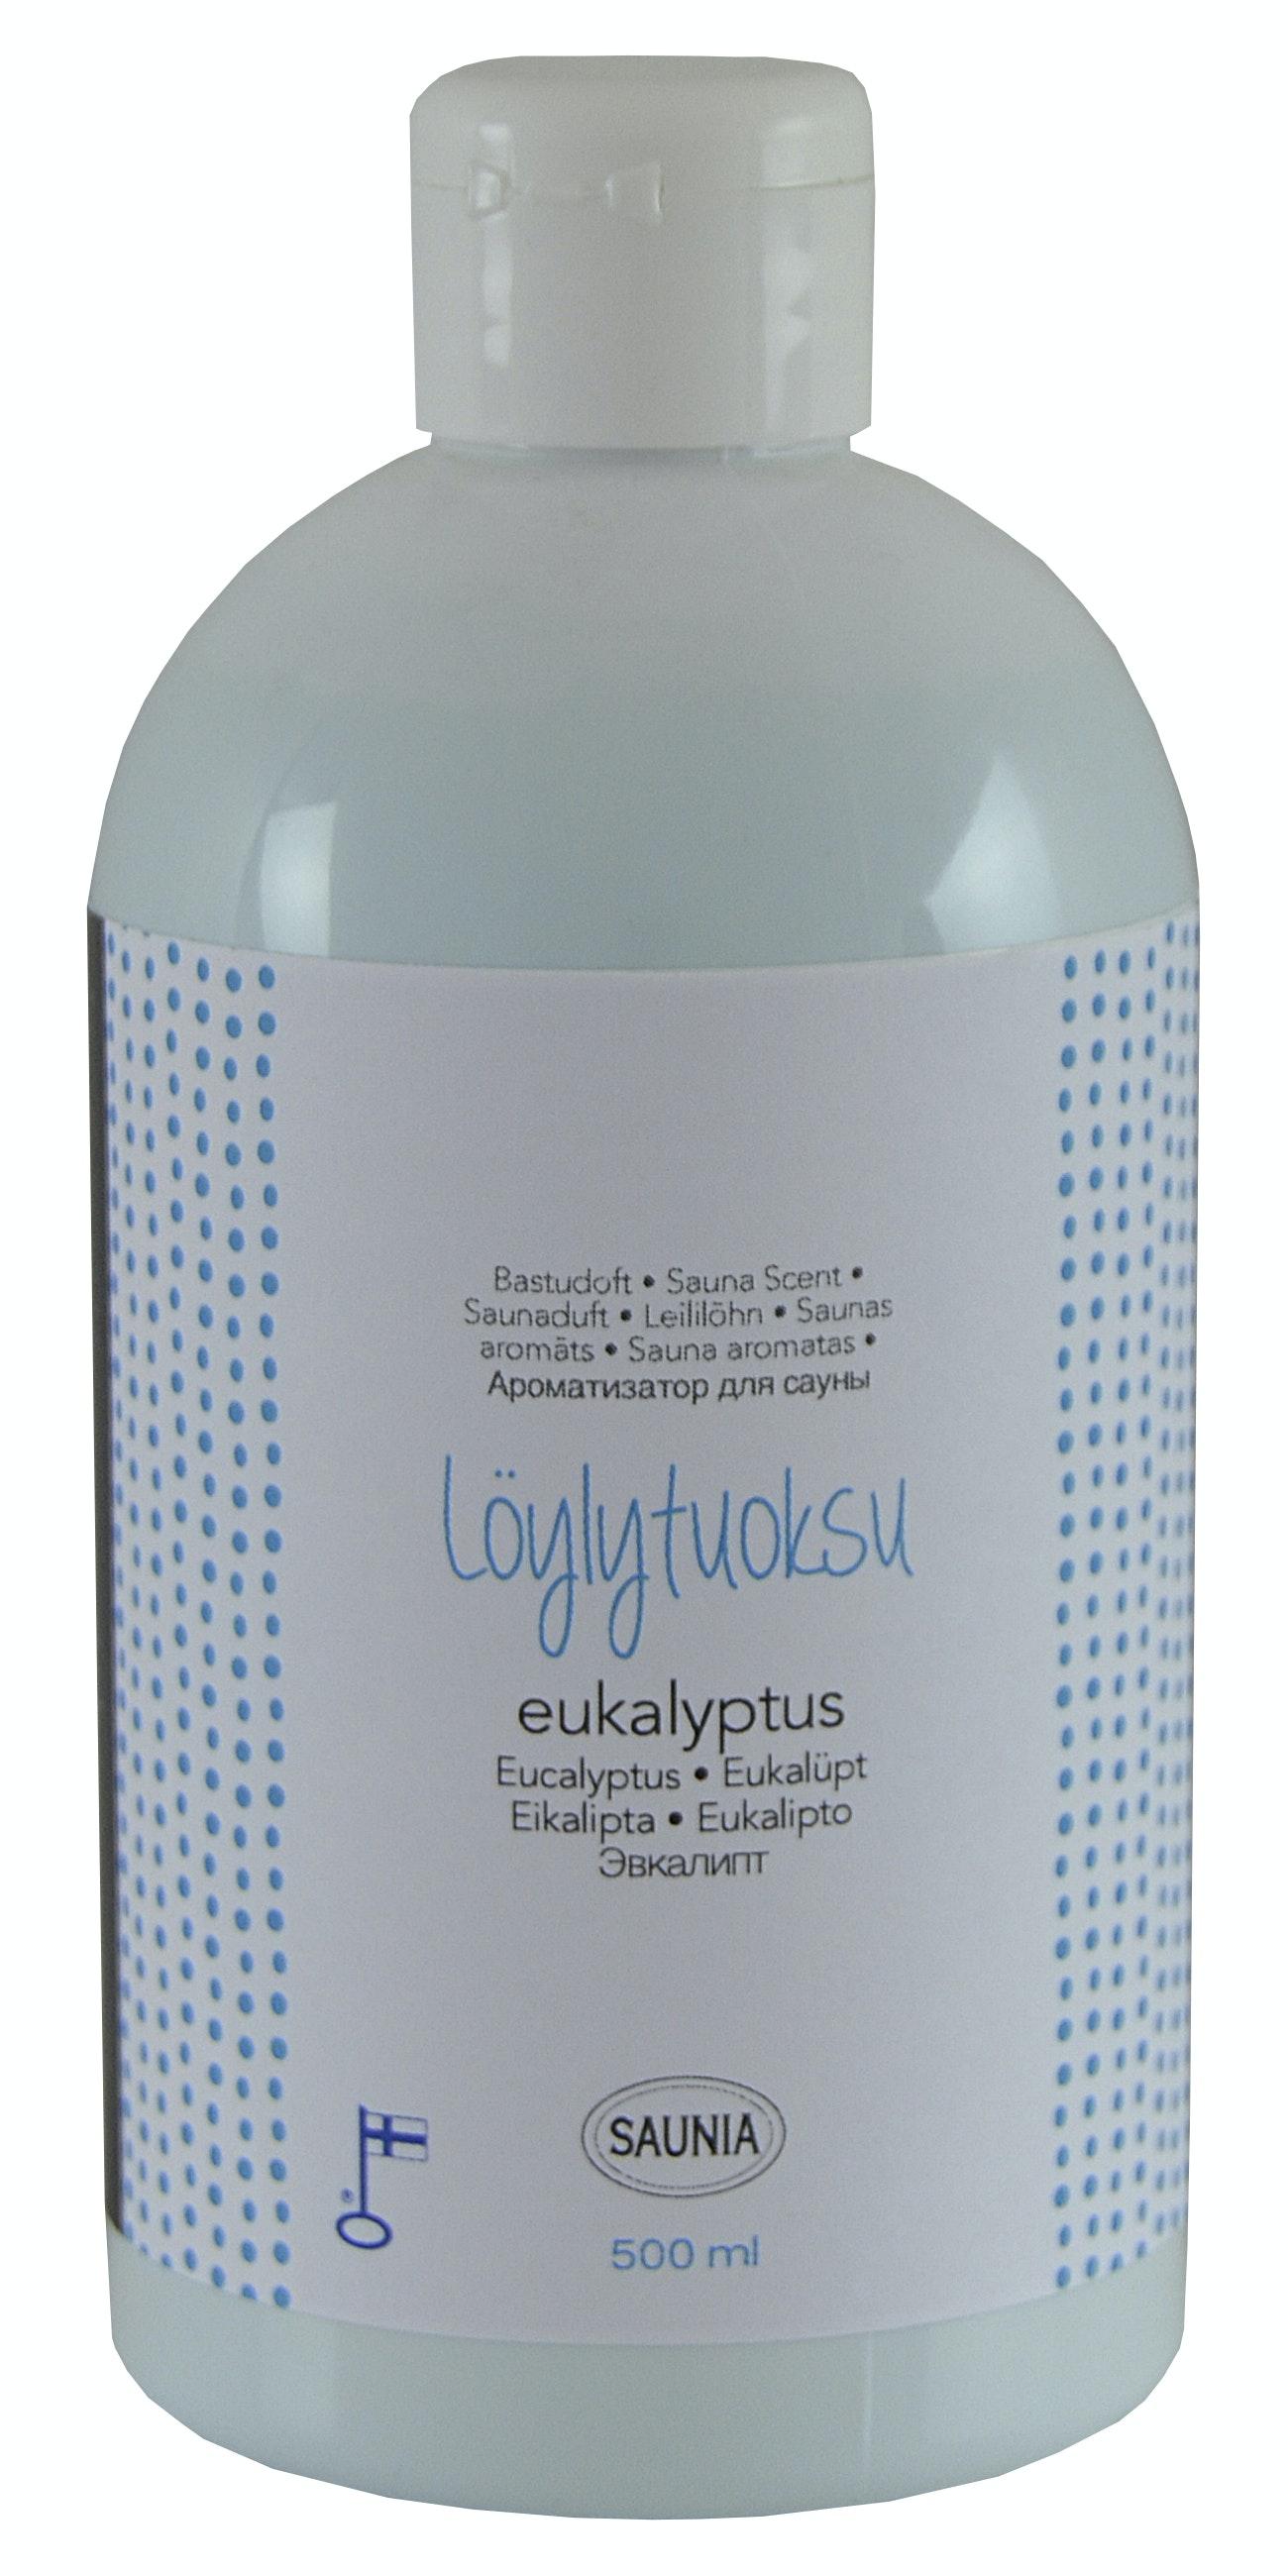 Bastudoft Saunia Eucalyptus 500ml